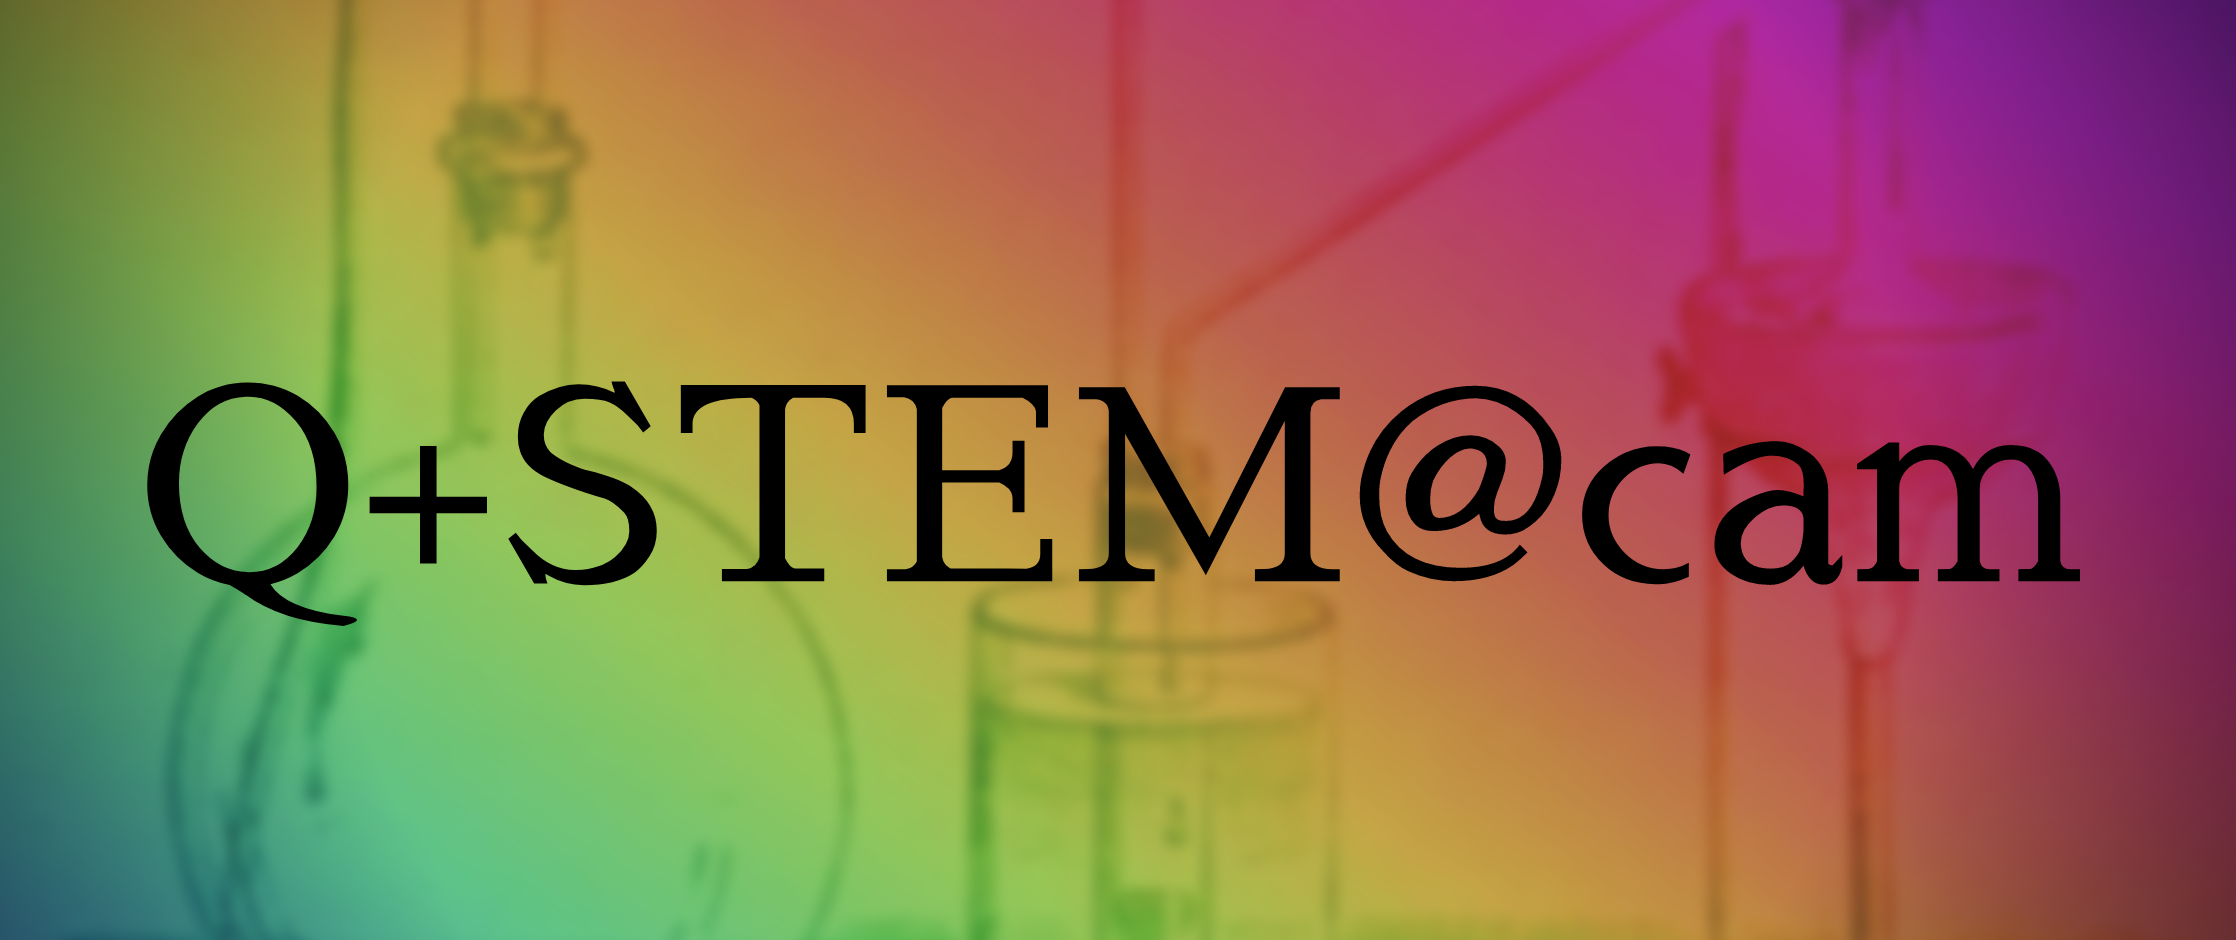 the Q+STEM logo